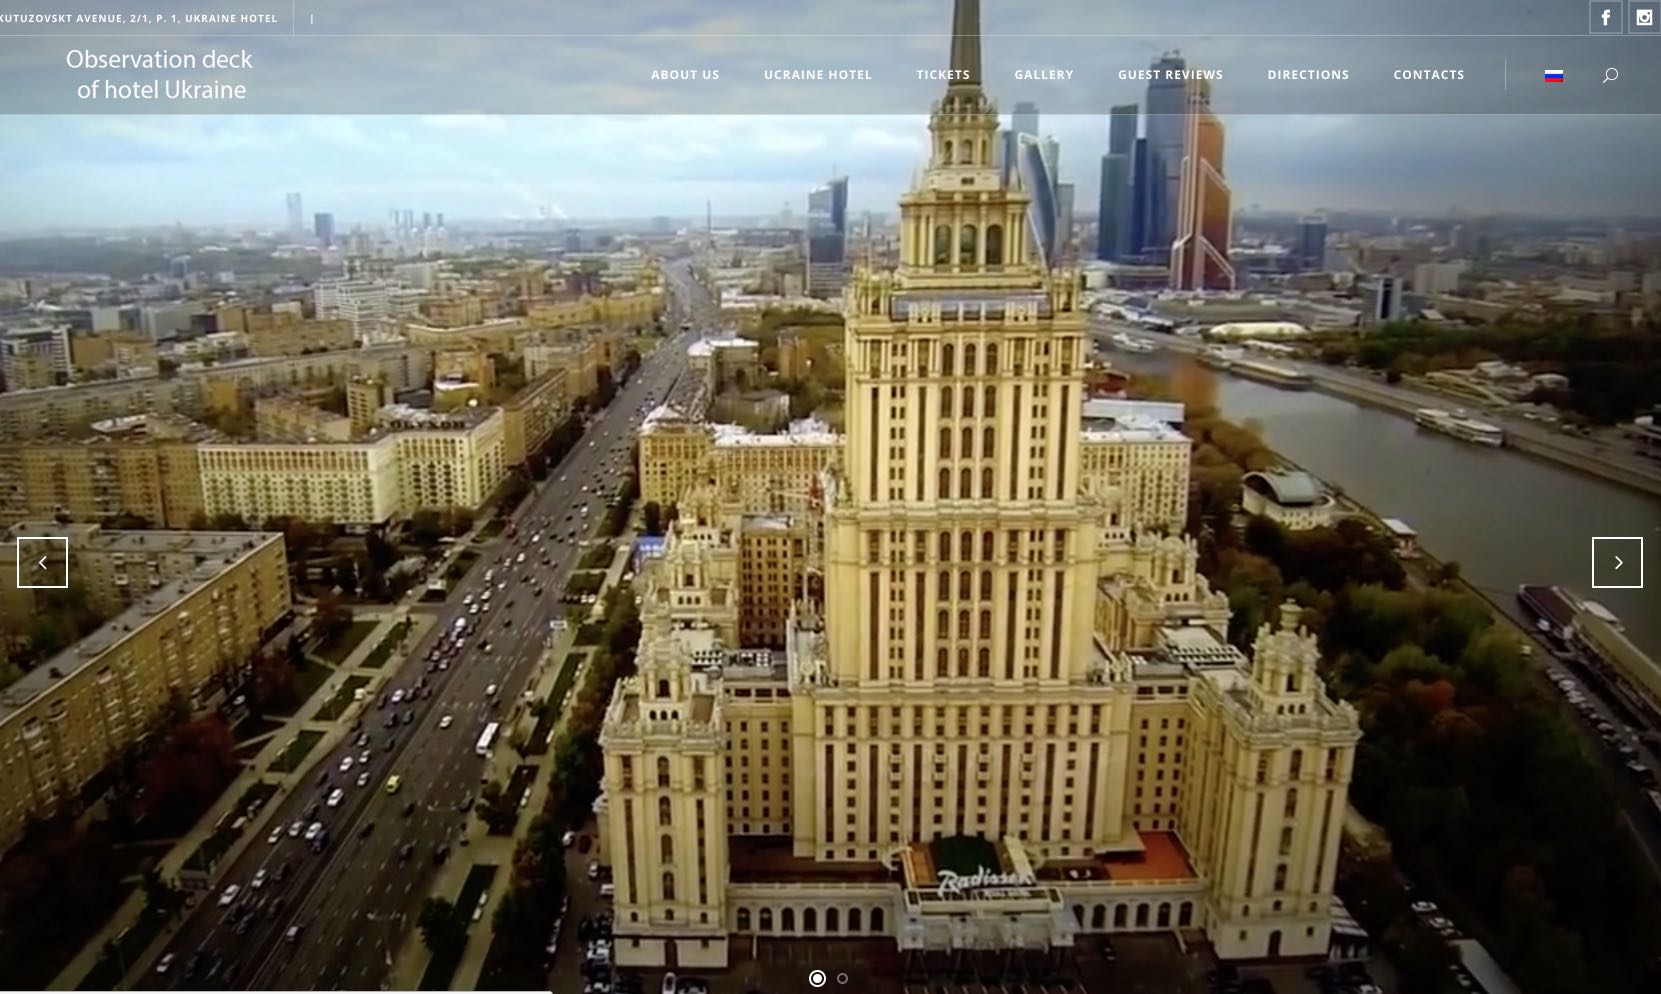 Observation platform Hotel Ukraine Moscow